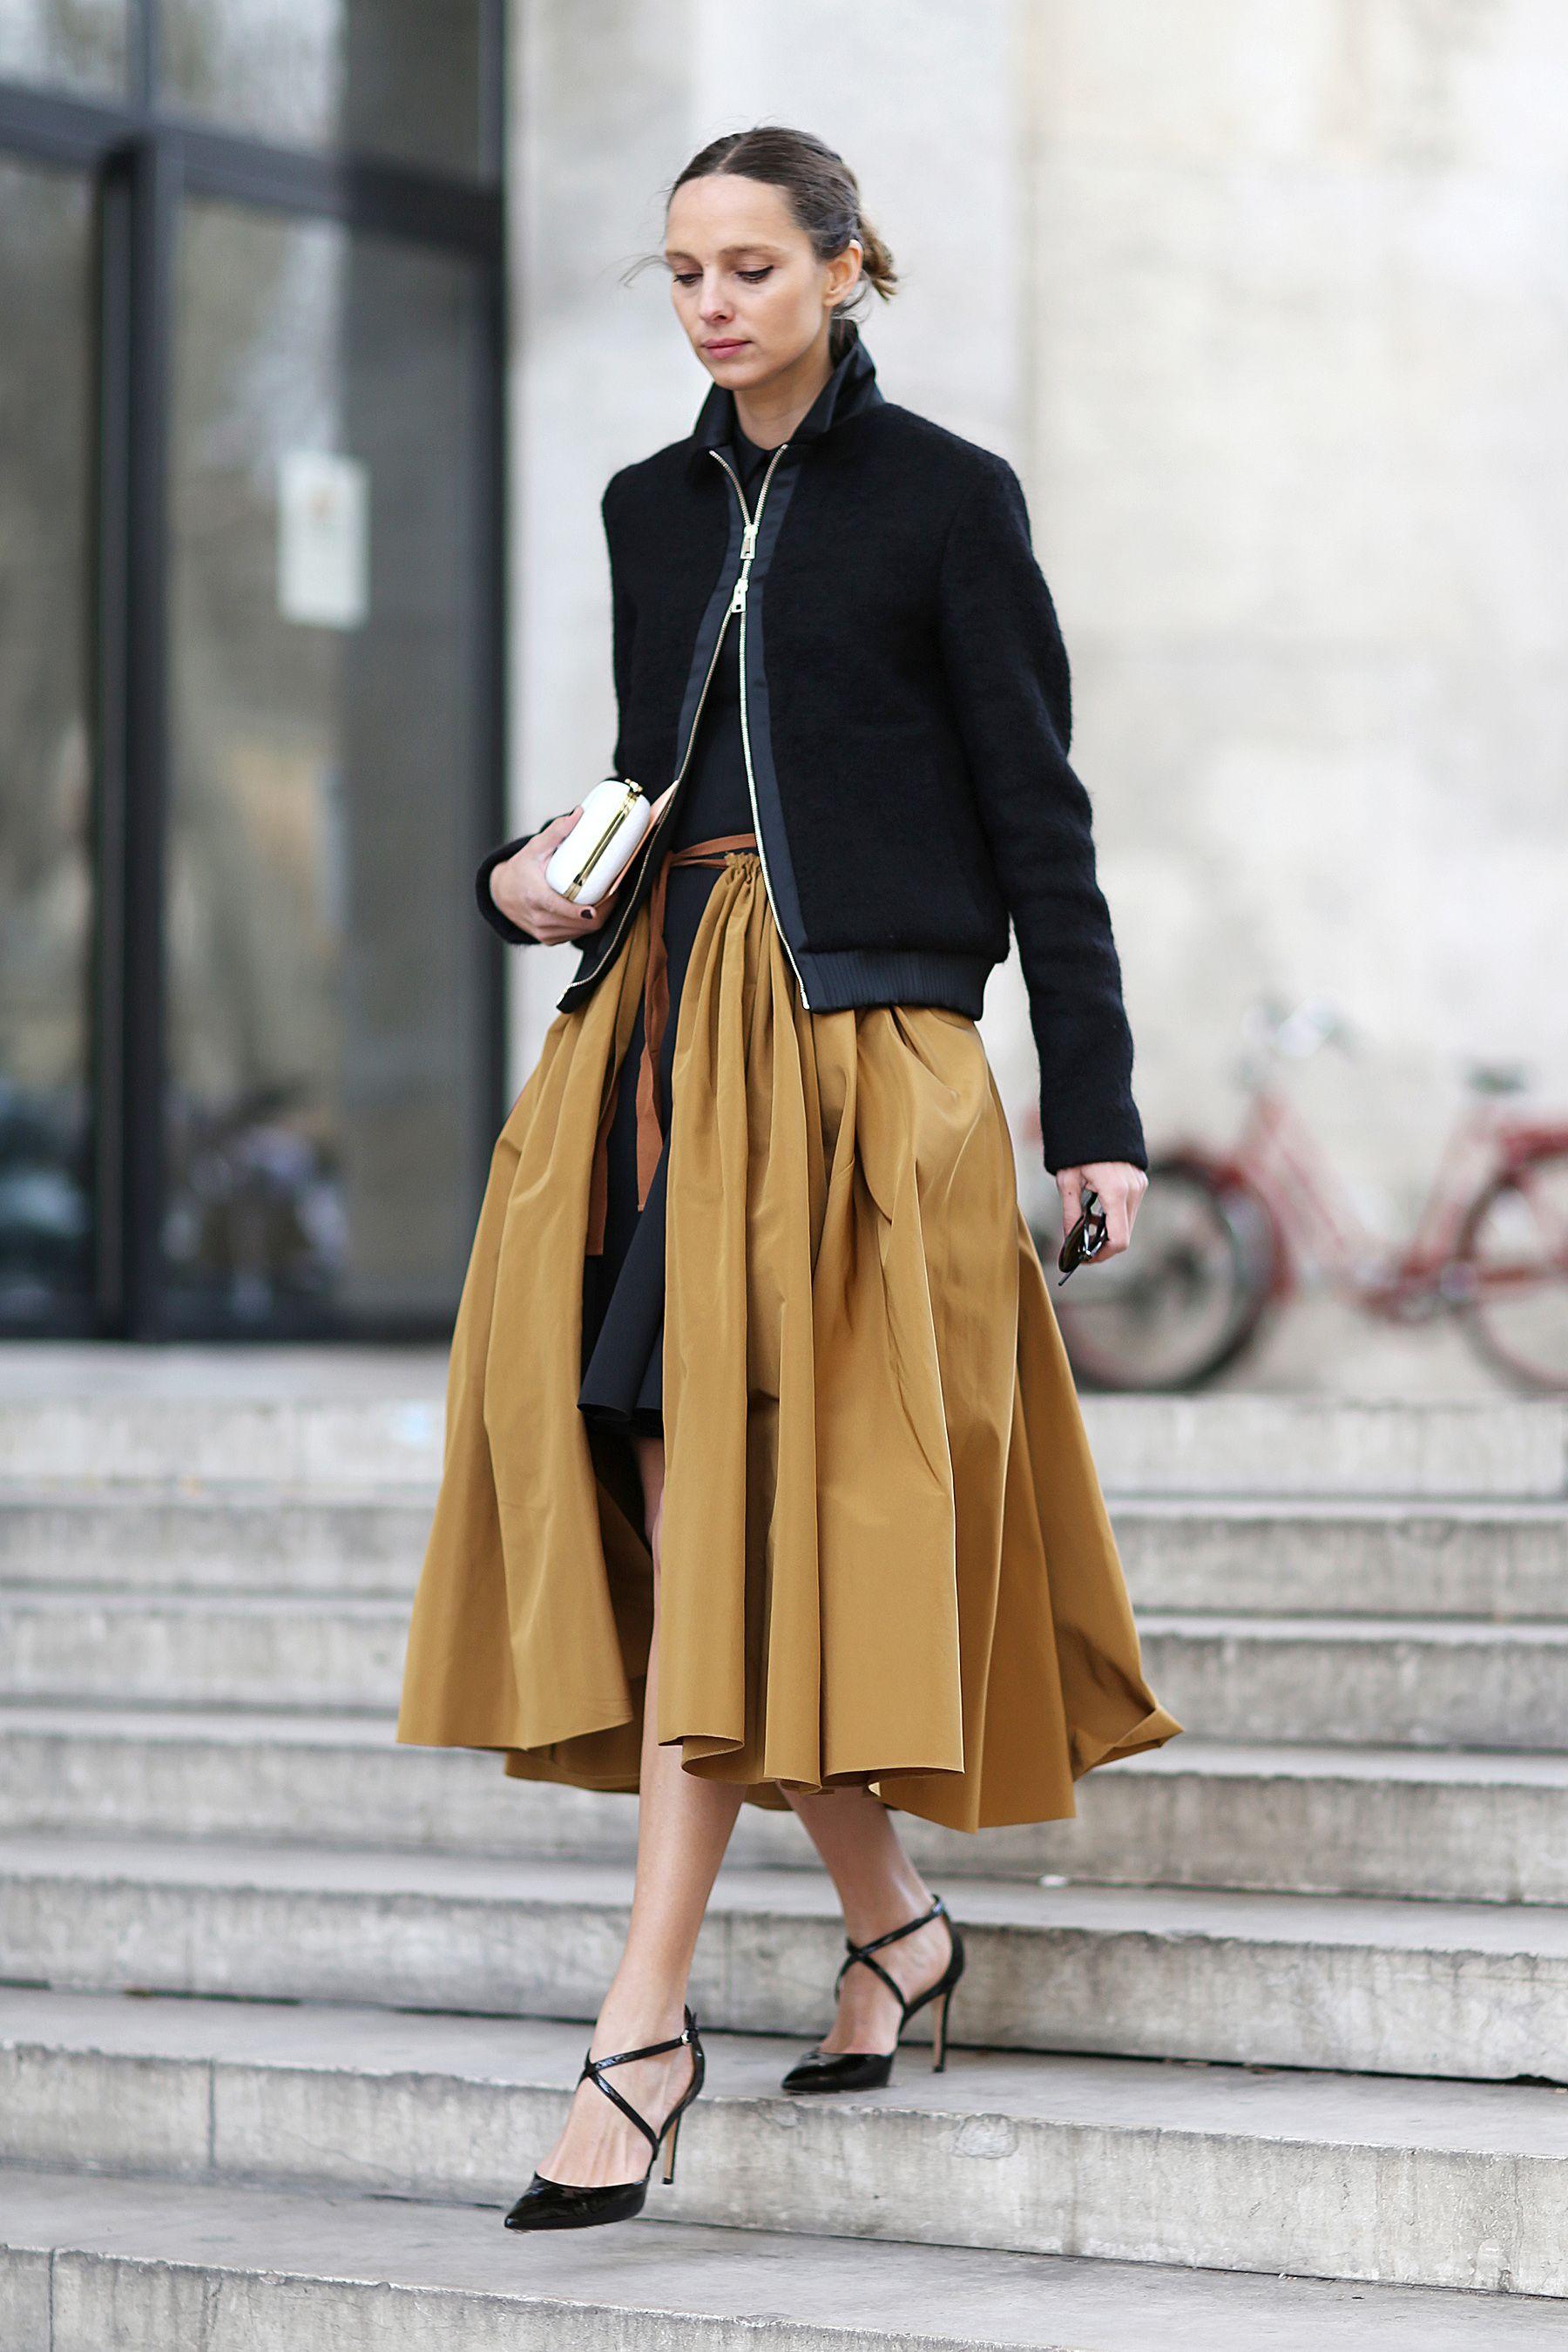 Midi skirts in winter